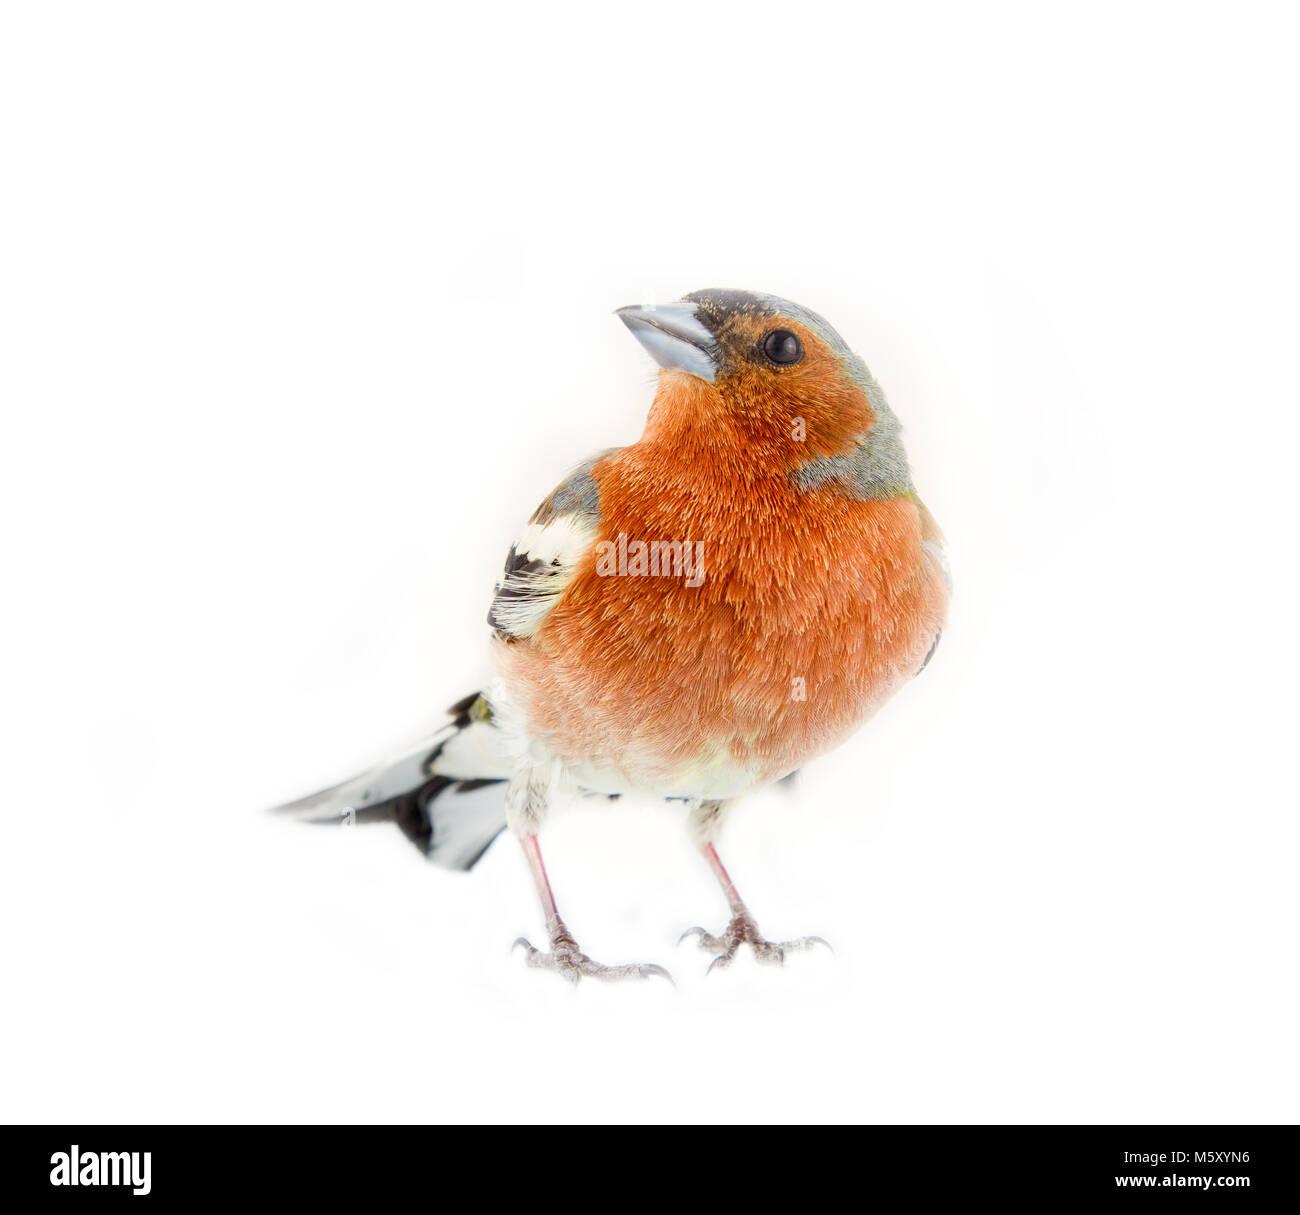 chaffinch (Fringilla coelebs) most common bird of Europe, forest bird, finches, thick beak, granivorous birds - - Stock Image